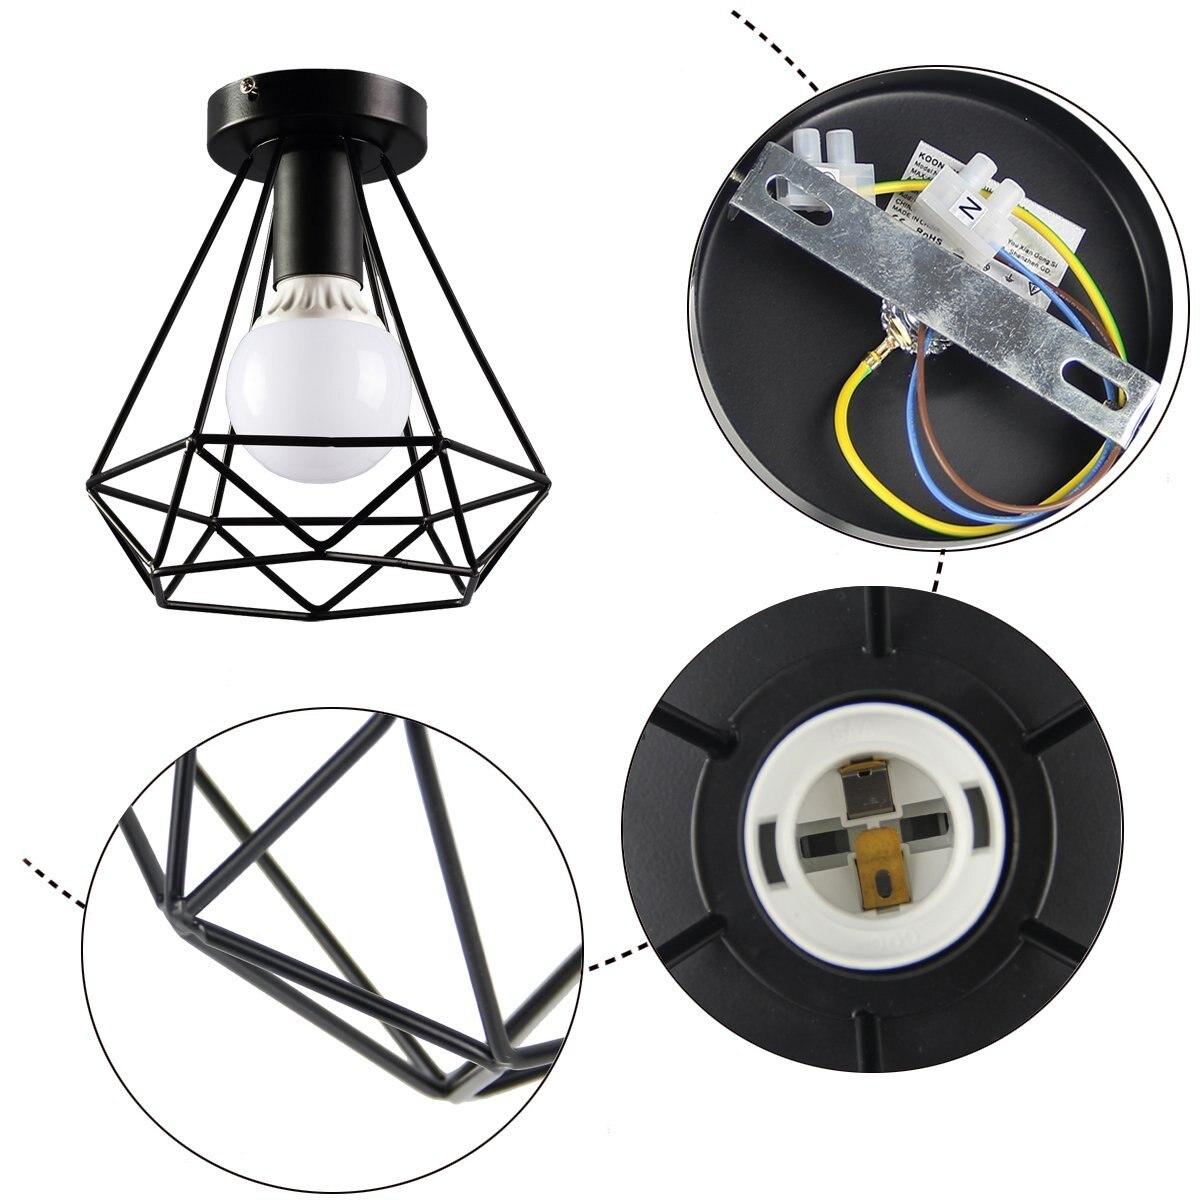 HTB1OOg8lHsrBKNjSZFpq6AXhFXa0 Vintage Industrial Rustic Flush Mount Ceiling Light Metal Lamp Fixture American-style village Style Creative Retro Light Lamps